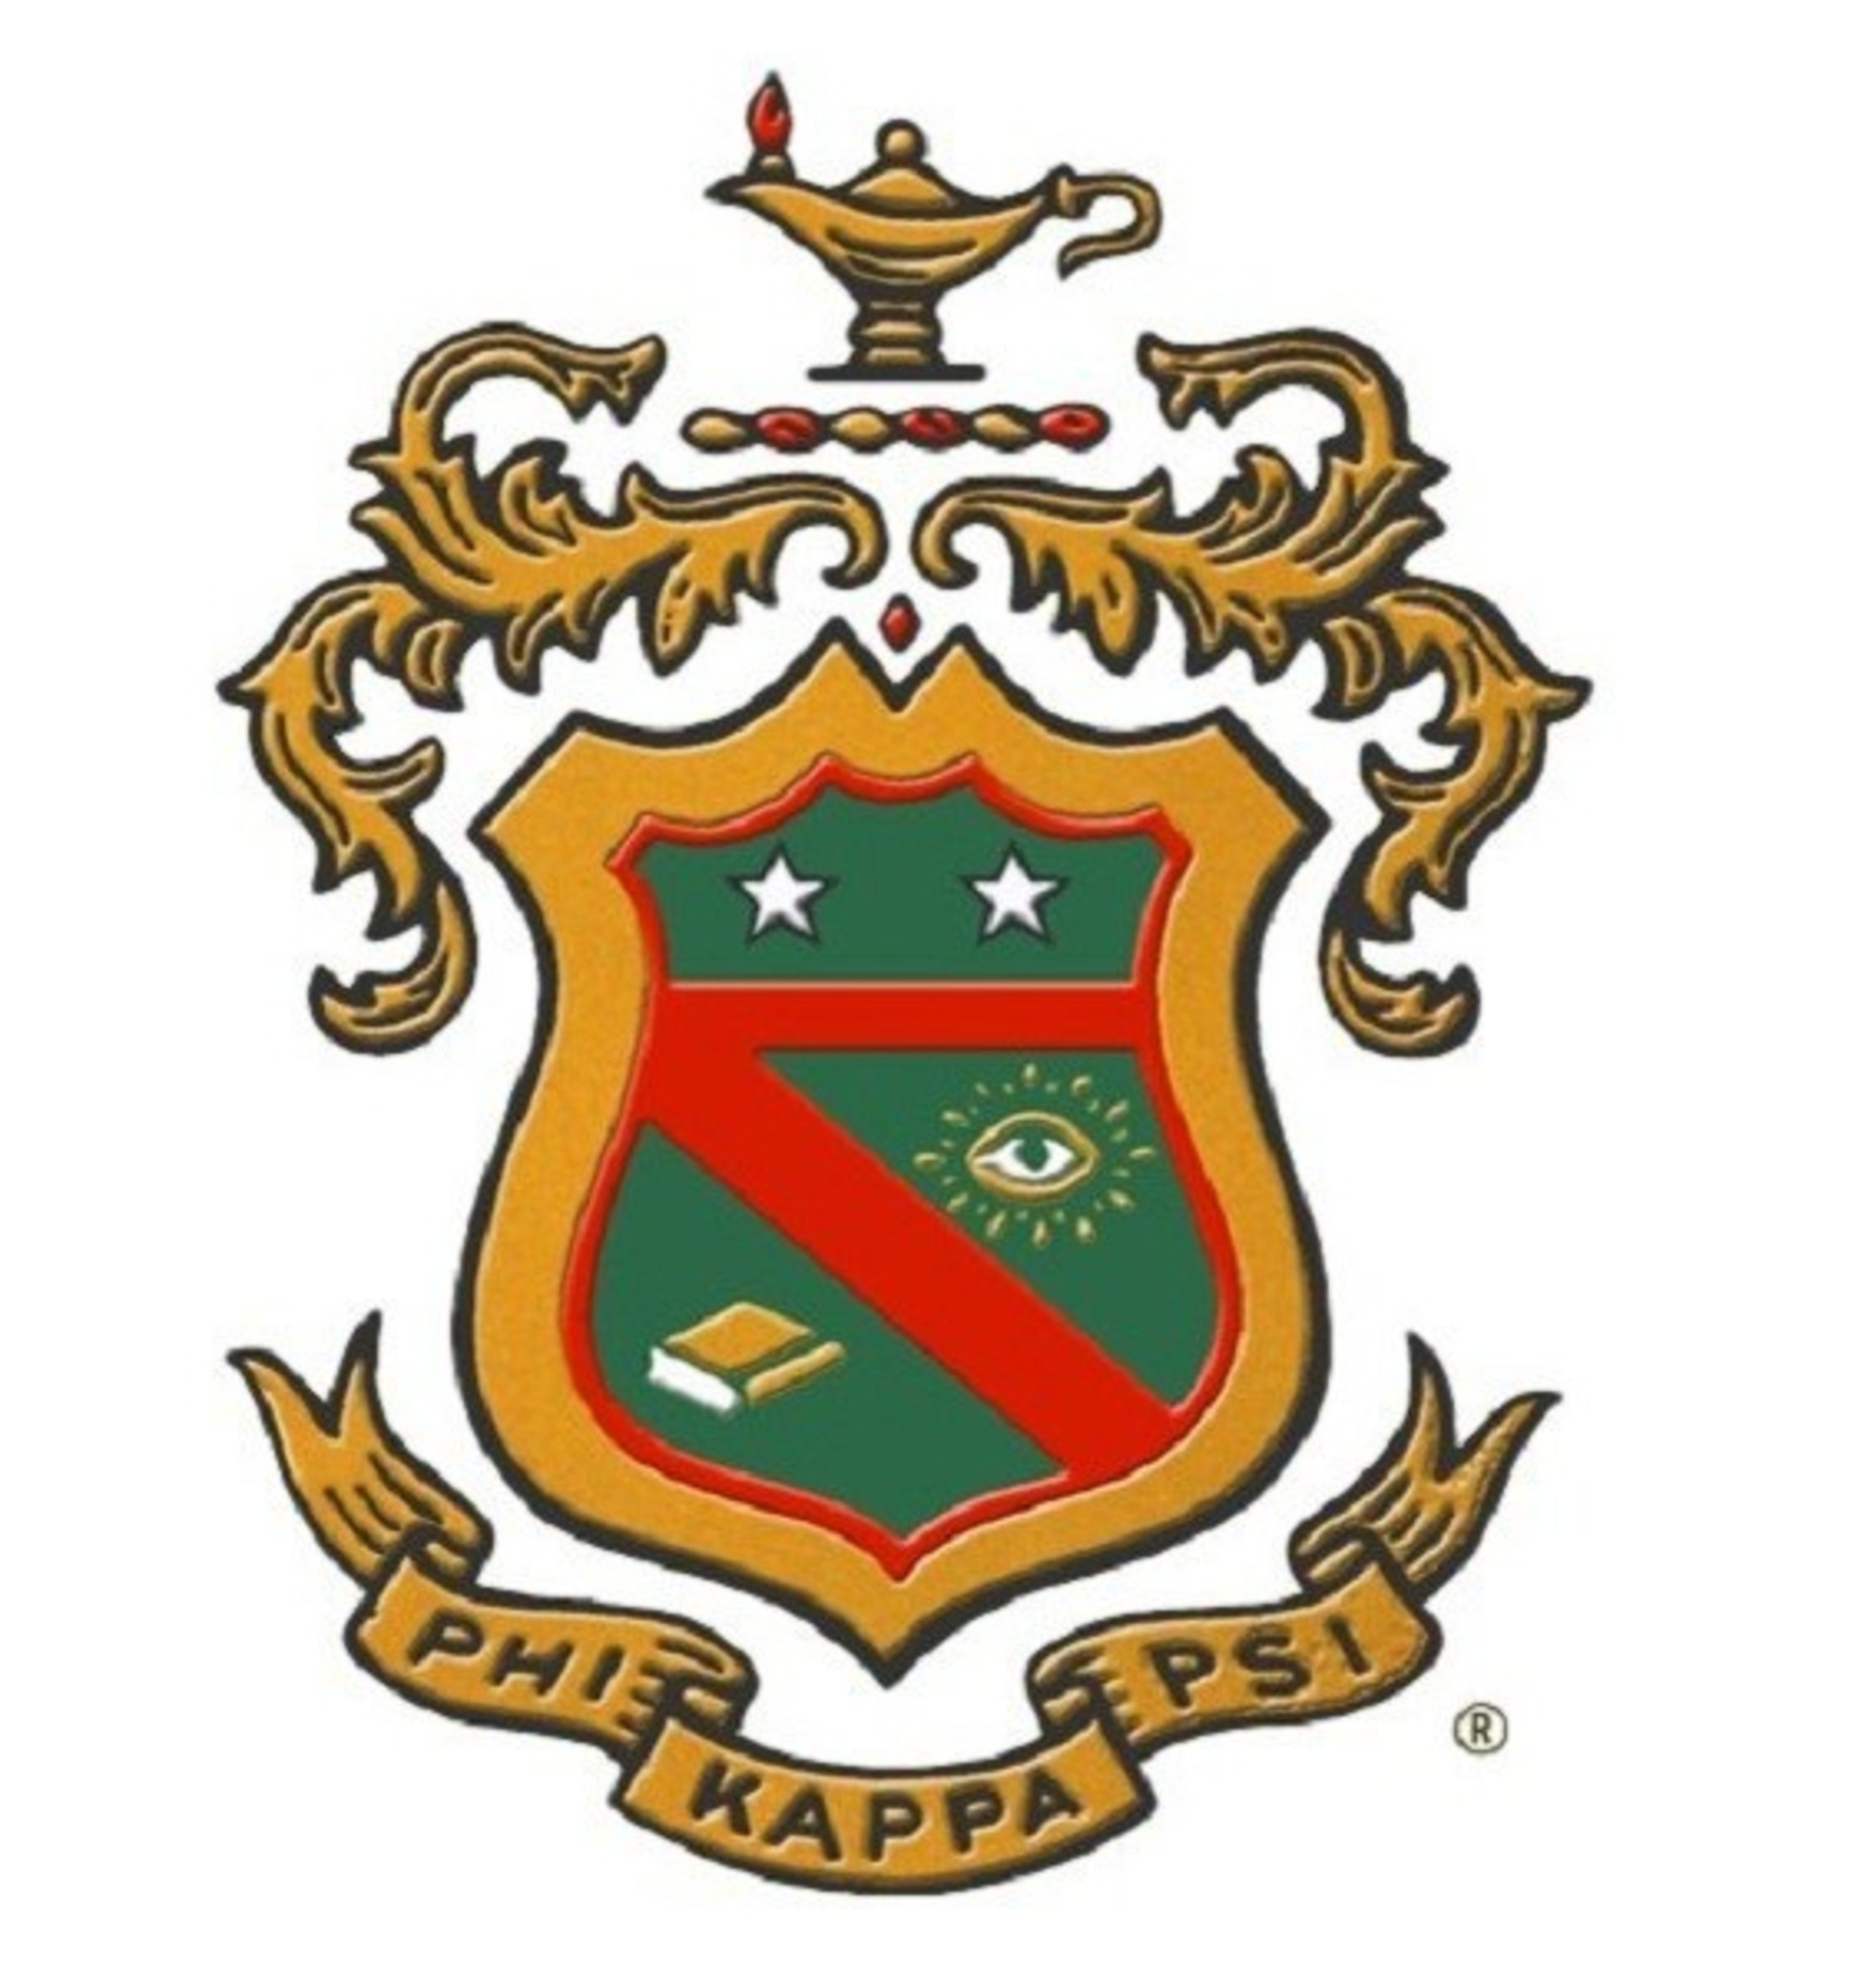 Virginia Alpha Chapter Phi Kappa Psi